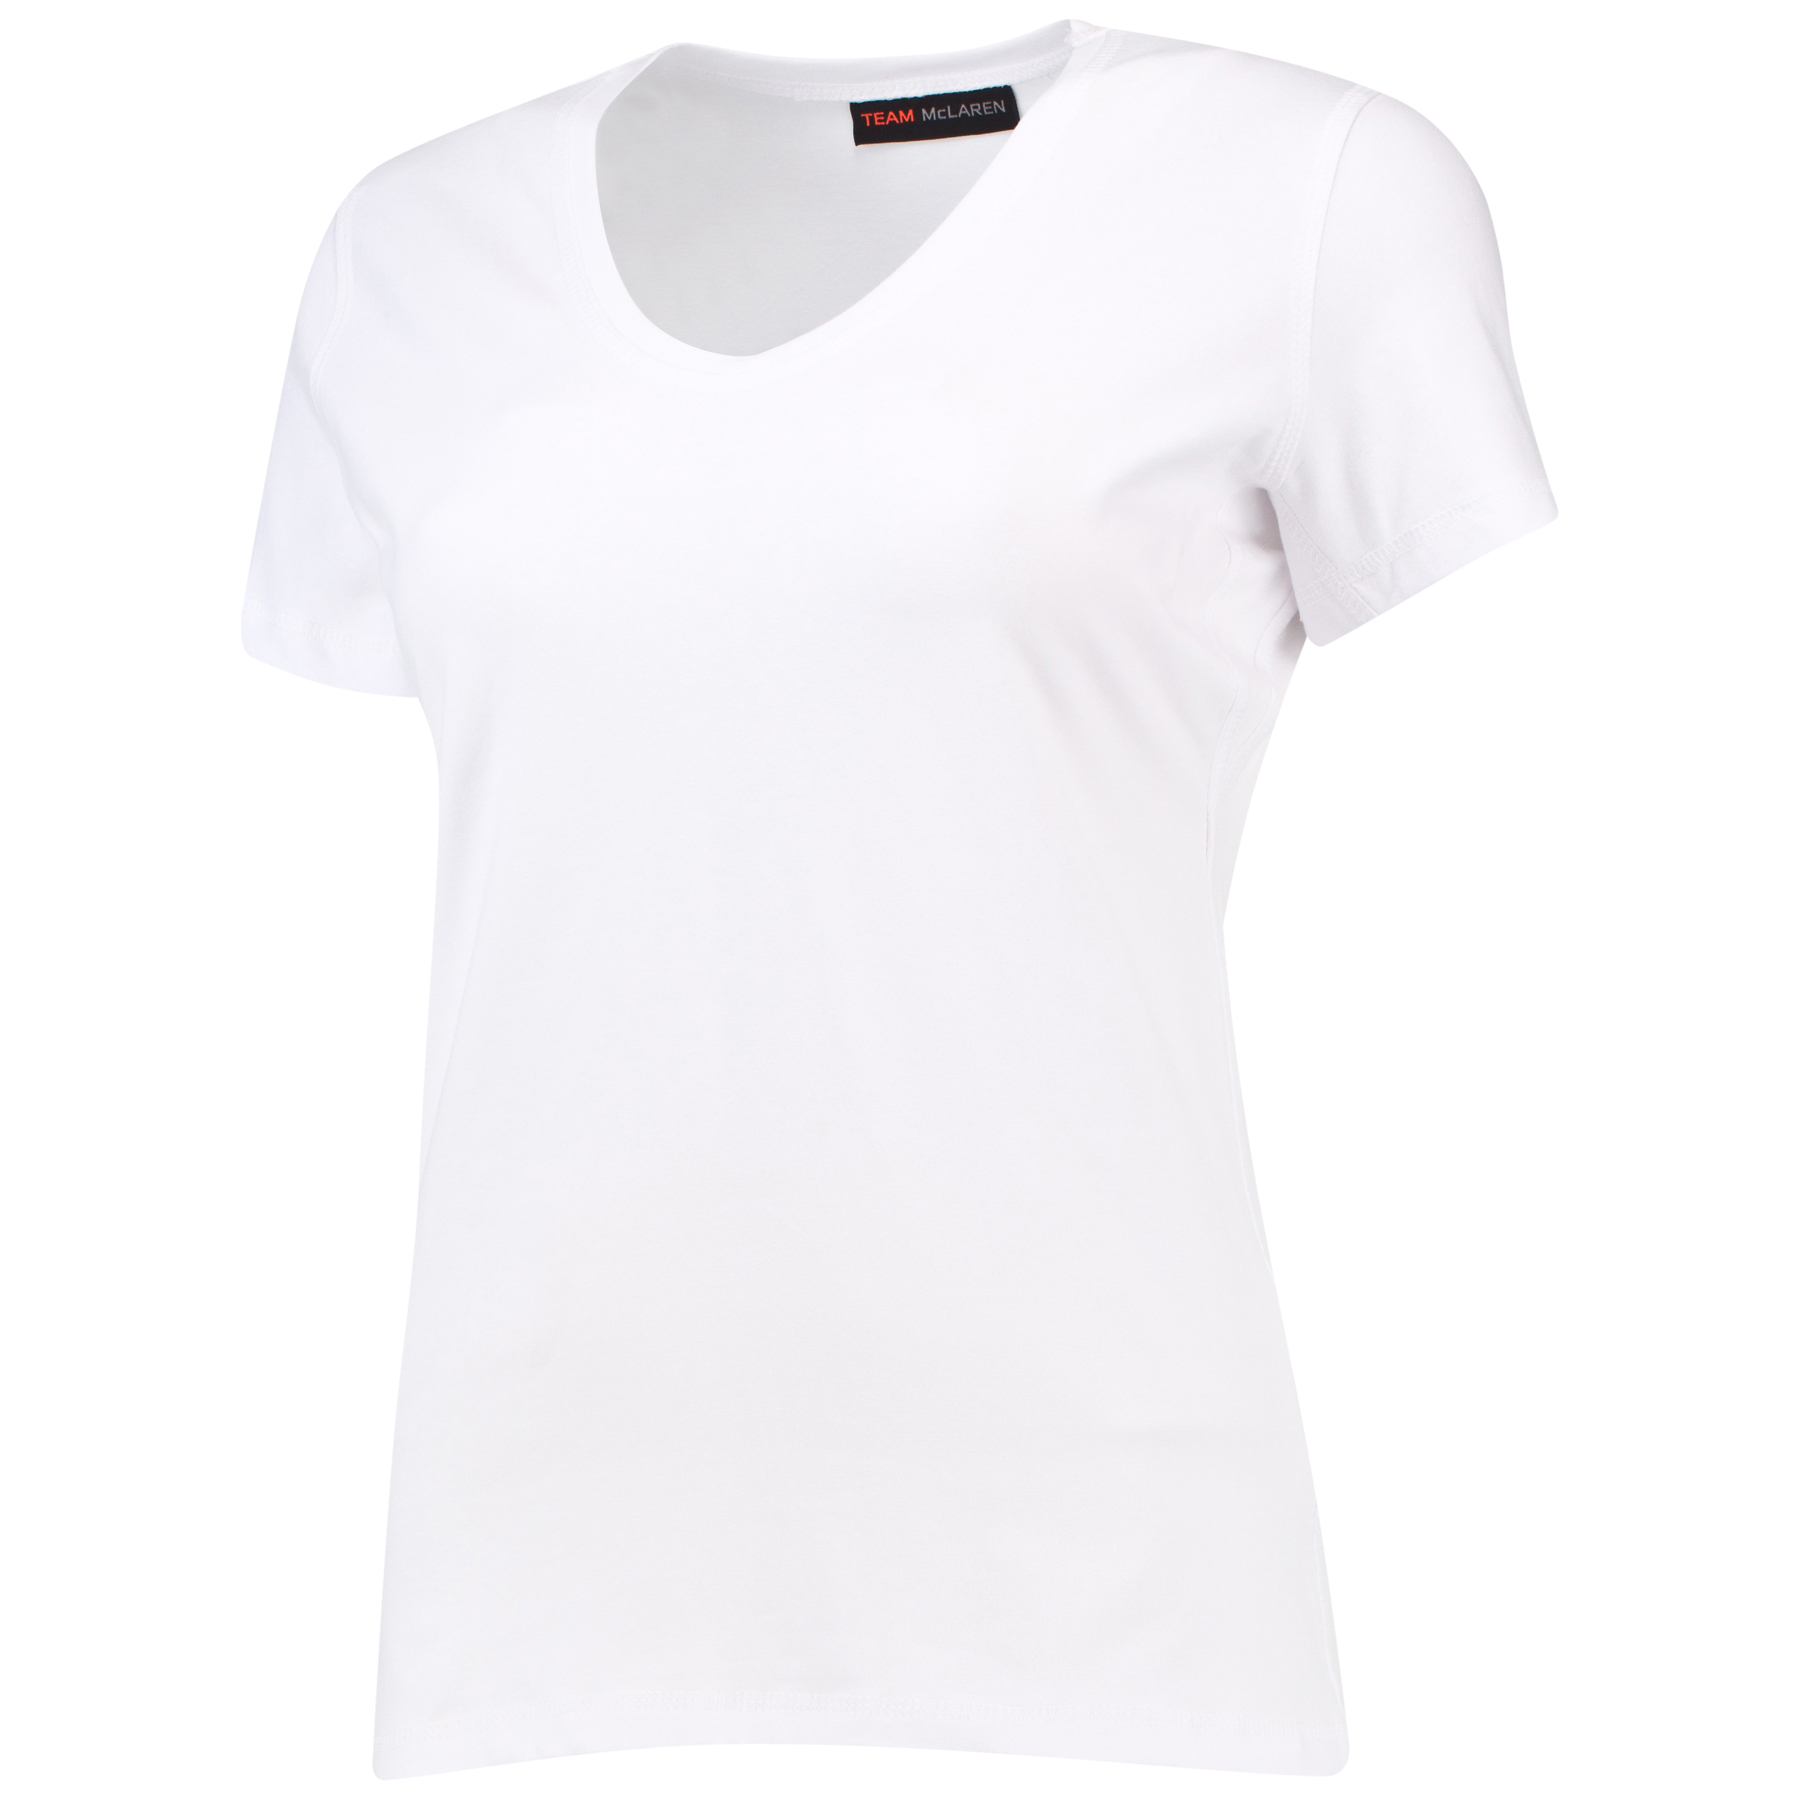 McLaren Quick Response T-Shirt - BLANK NOT FOR SALE - White Womens